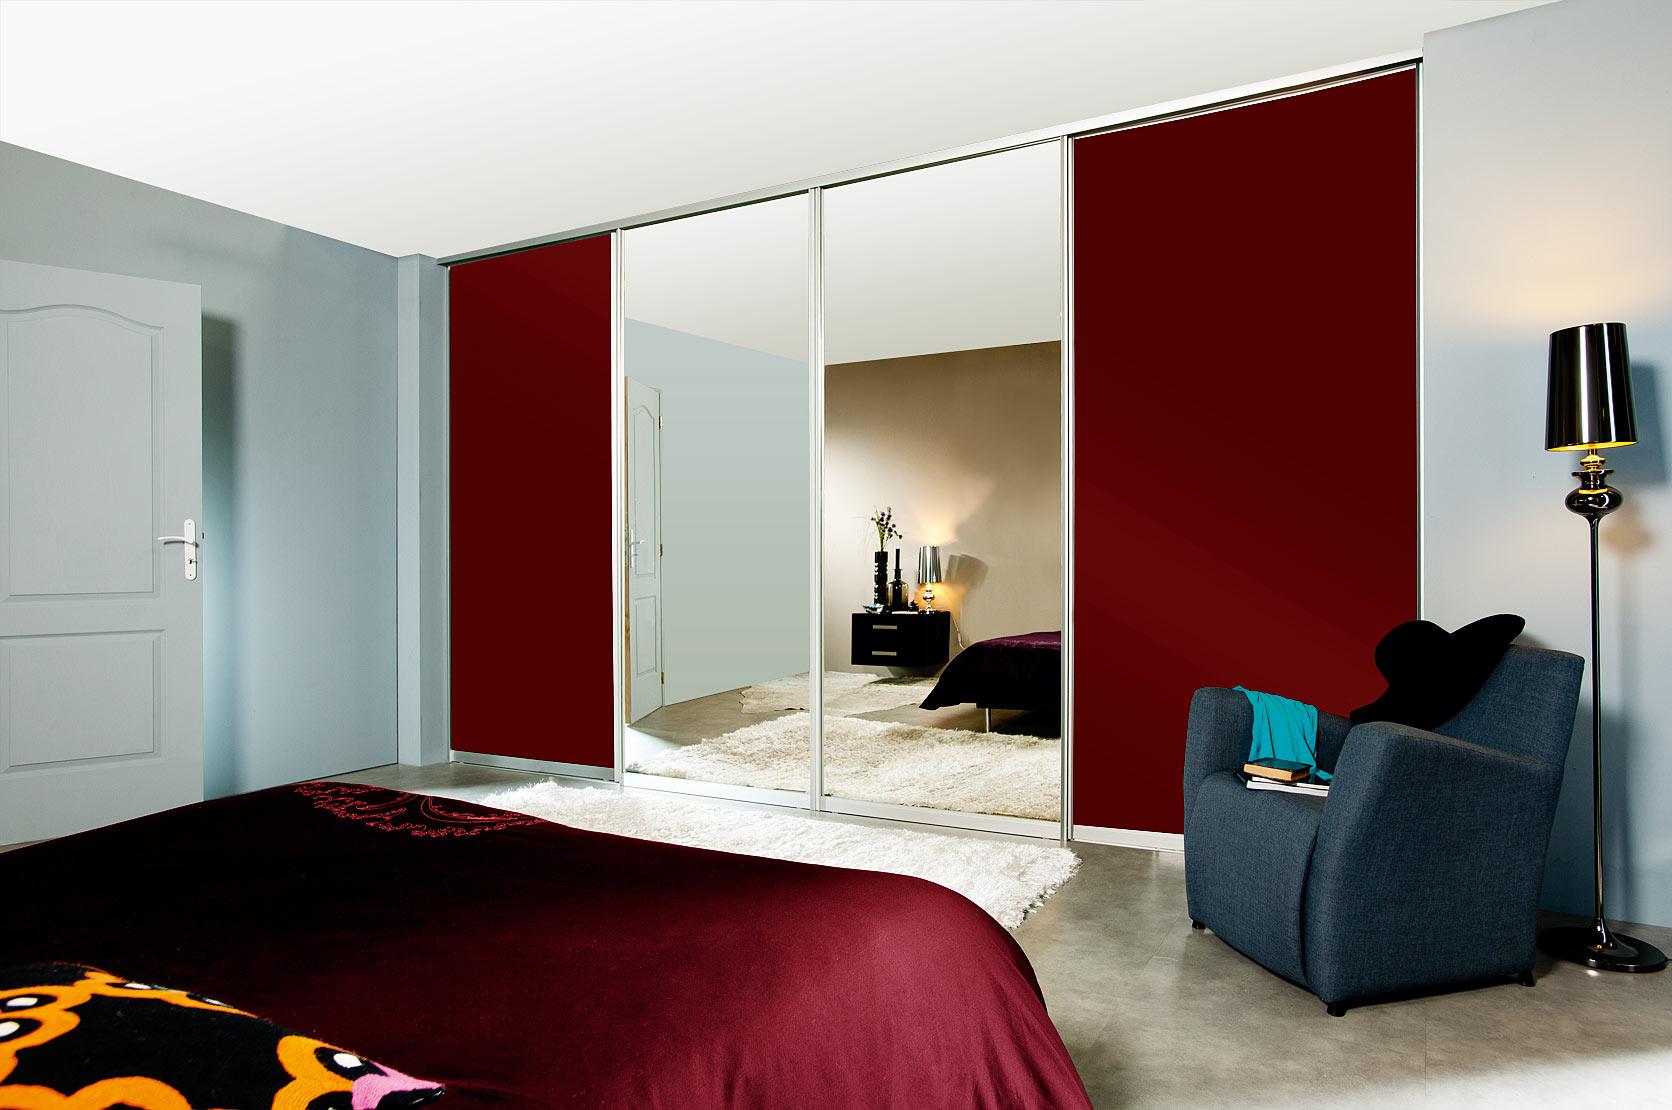 Chambre A Coucher Porte Coulissante - Fashion Designs